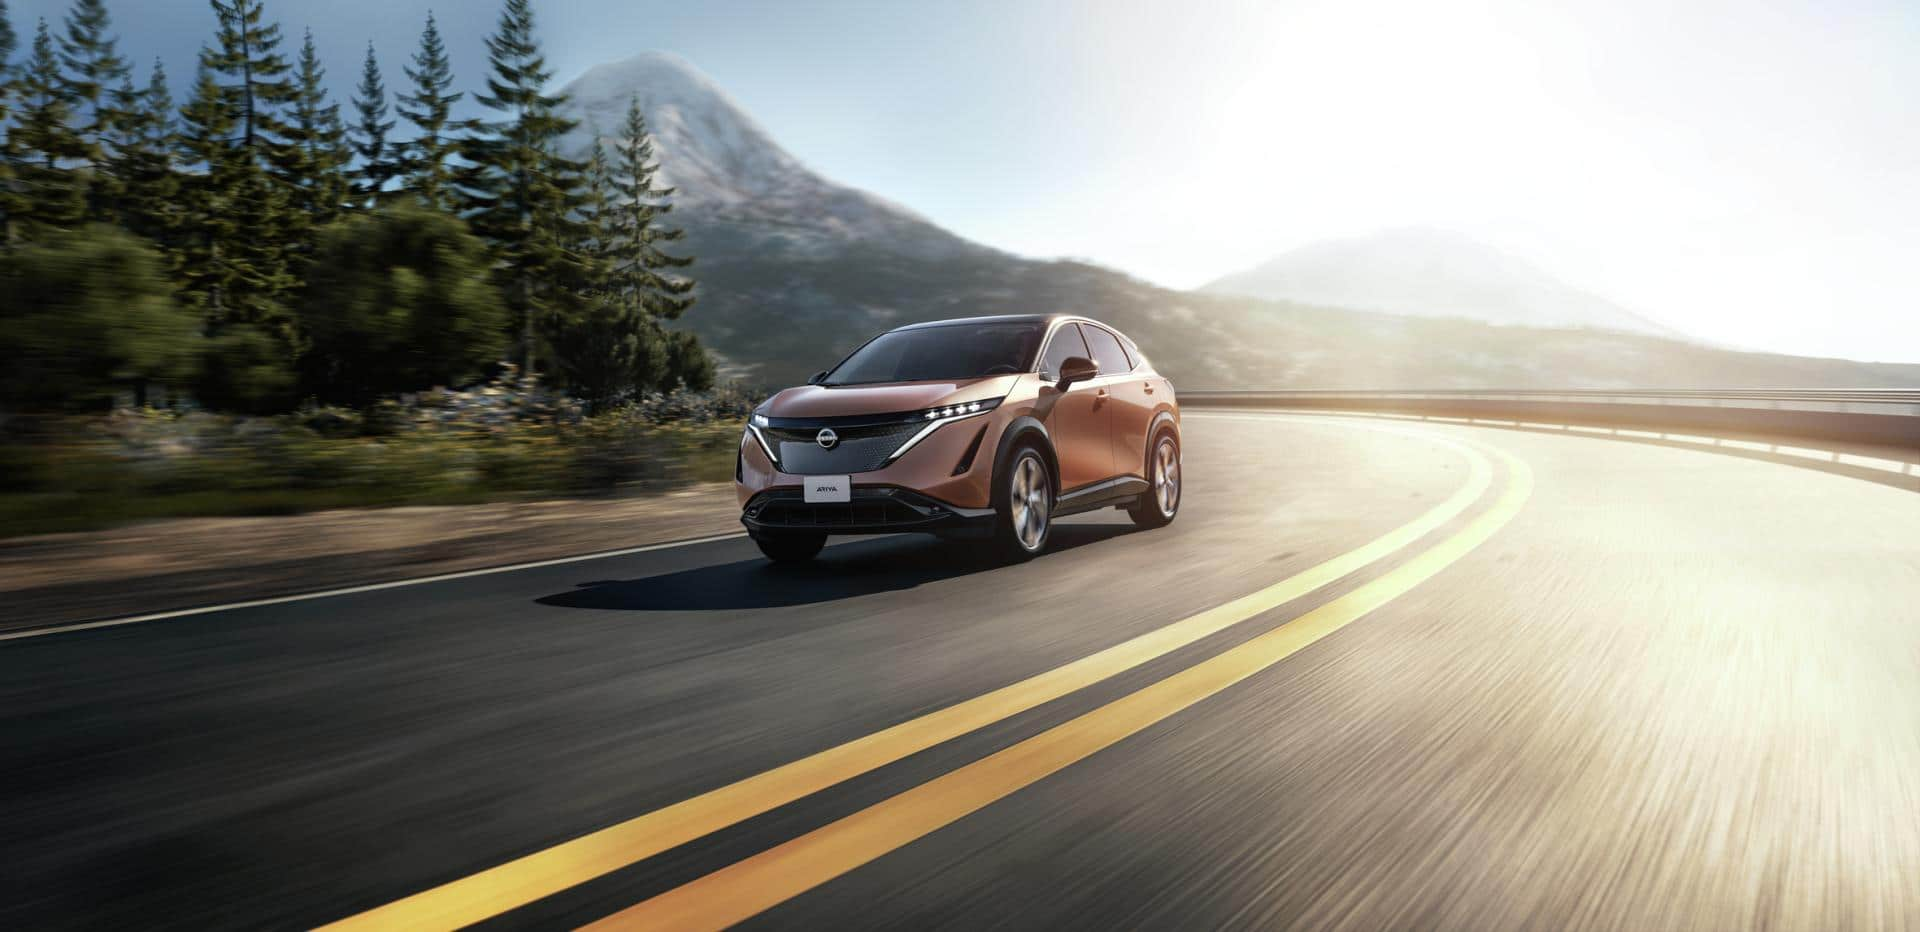 Nissan Ariya geht auf virtuelle Probefahrt